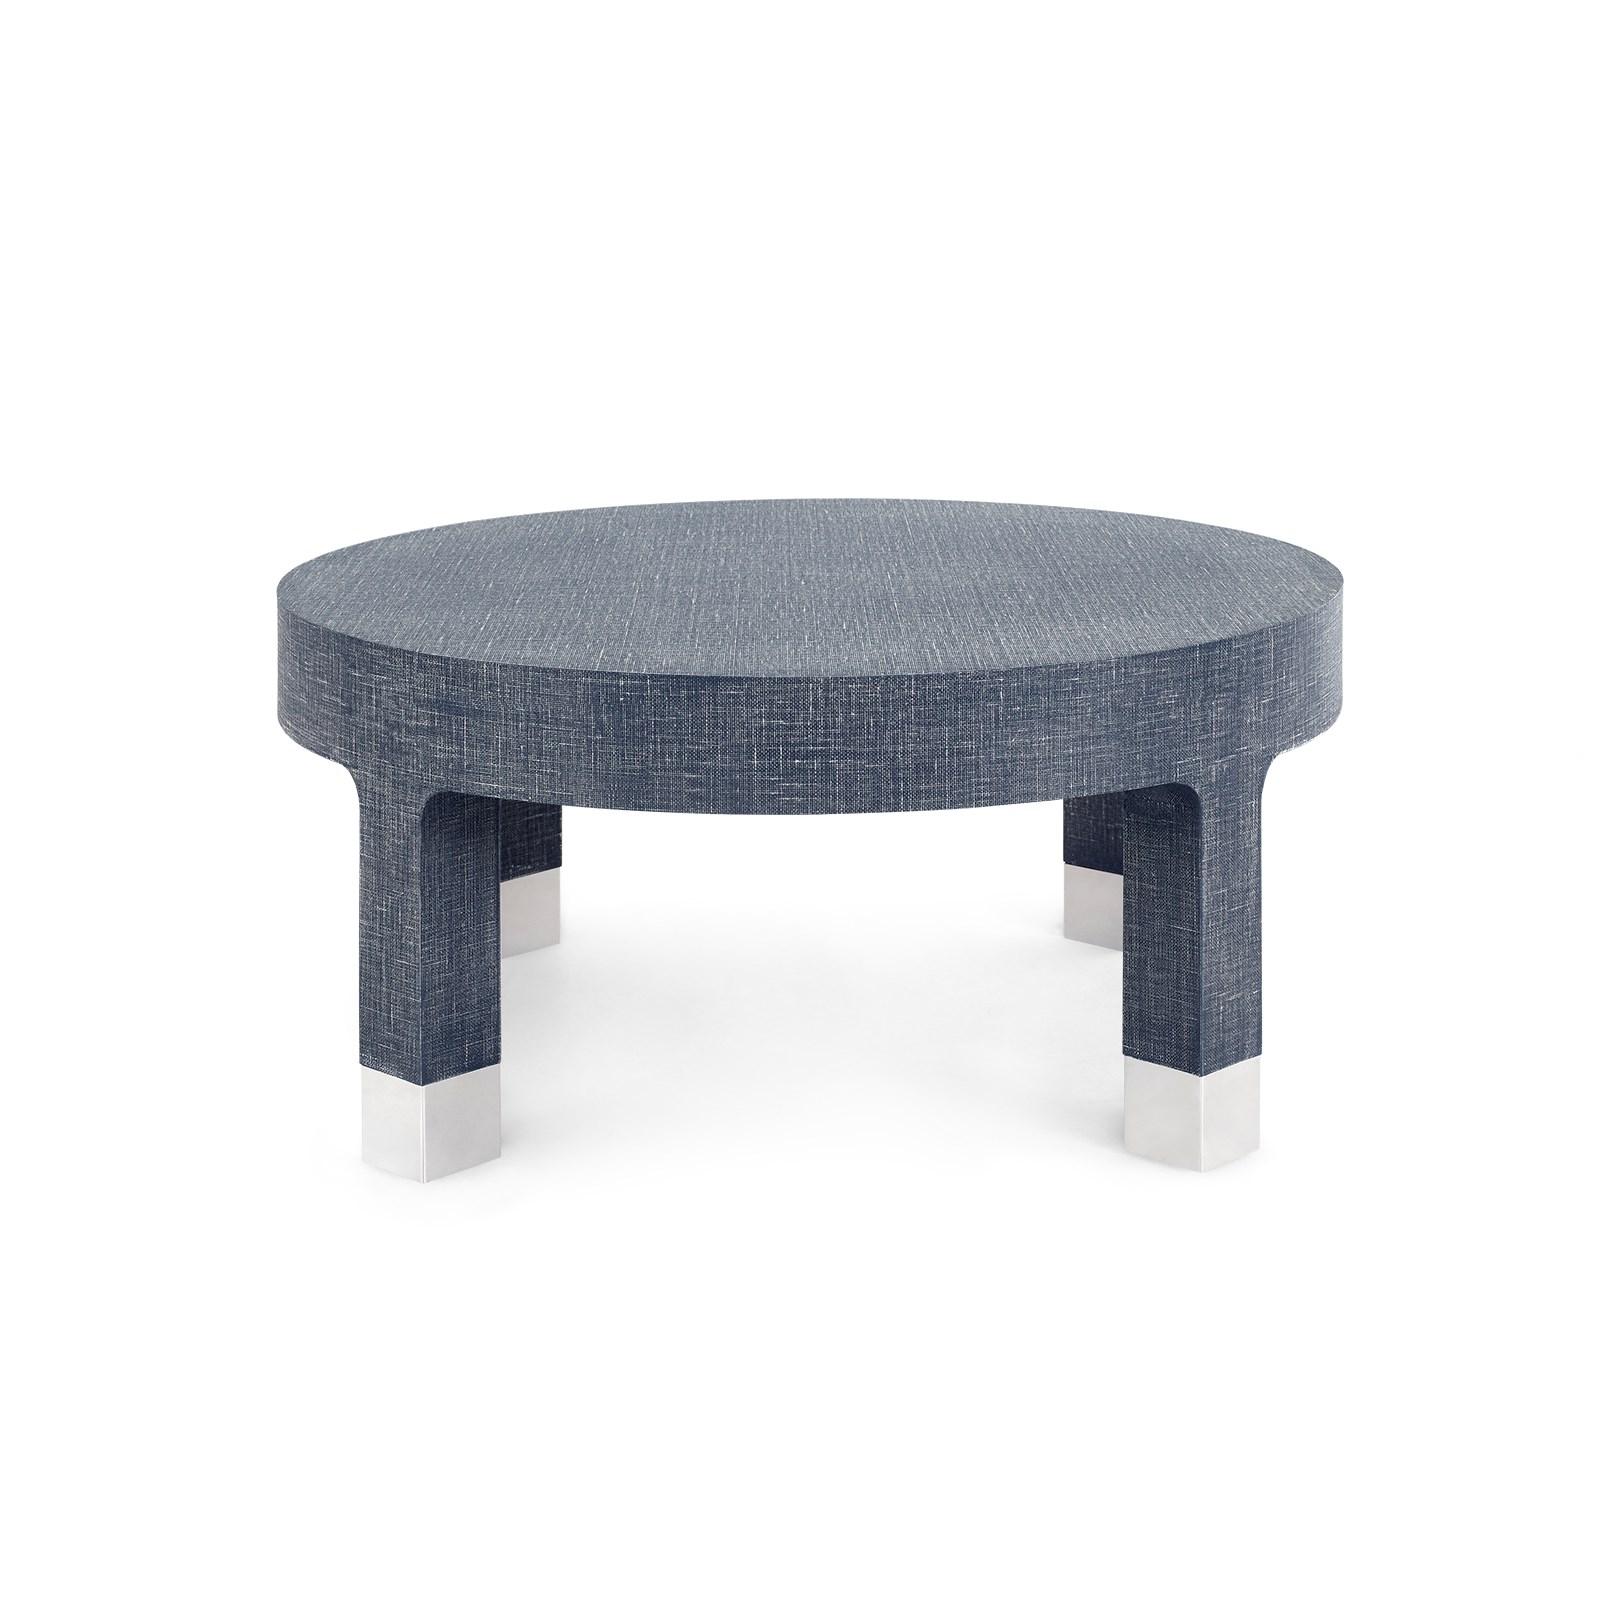 dakota round coffee table navy blue bungalow 5